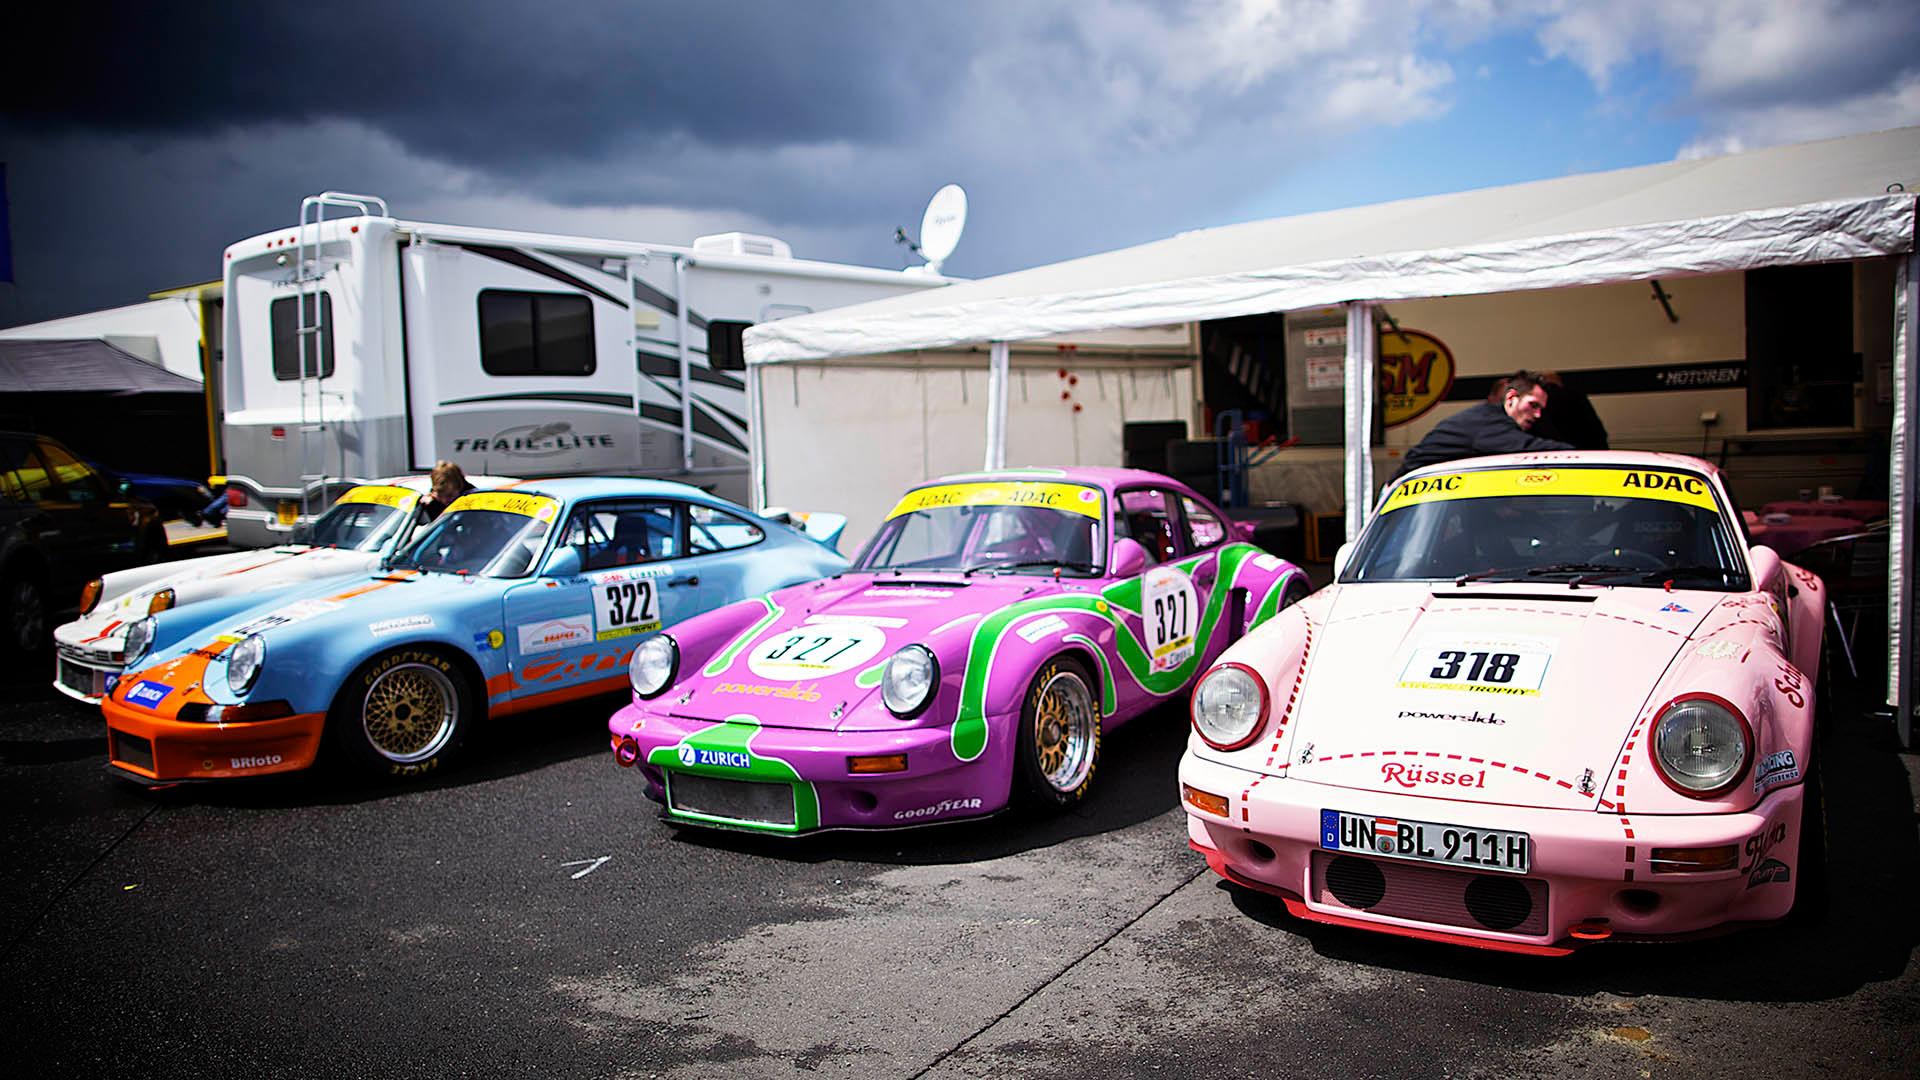 Porsche Vintage Cars Wallpaper | HD Car Wallpapers | ID #2755